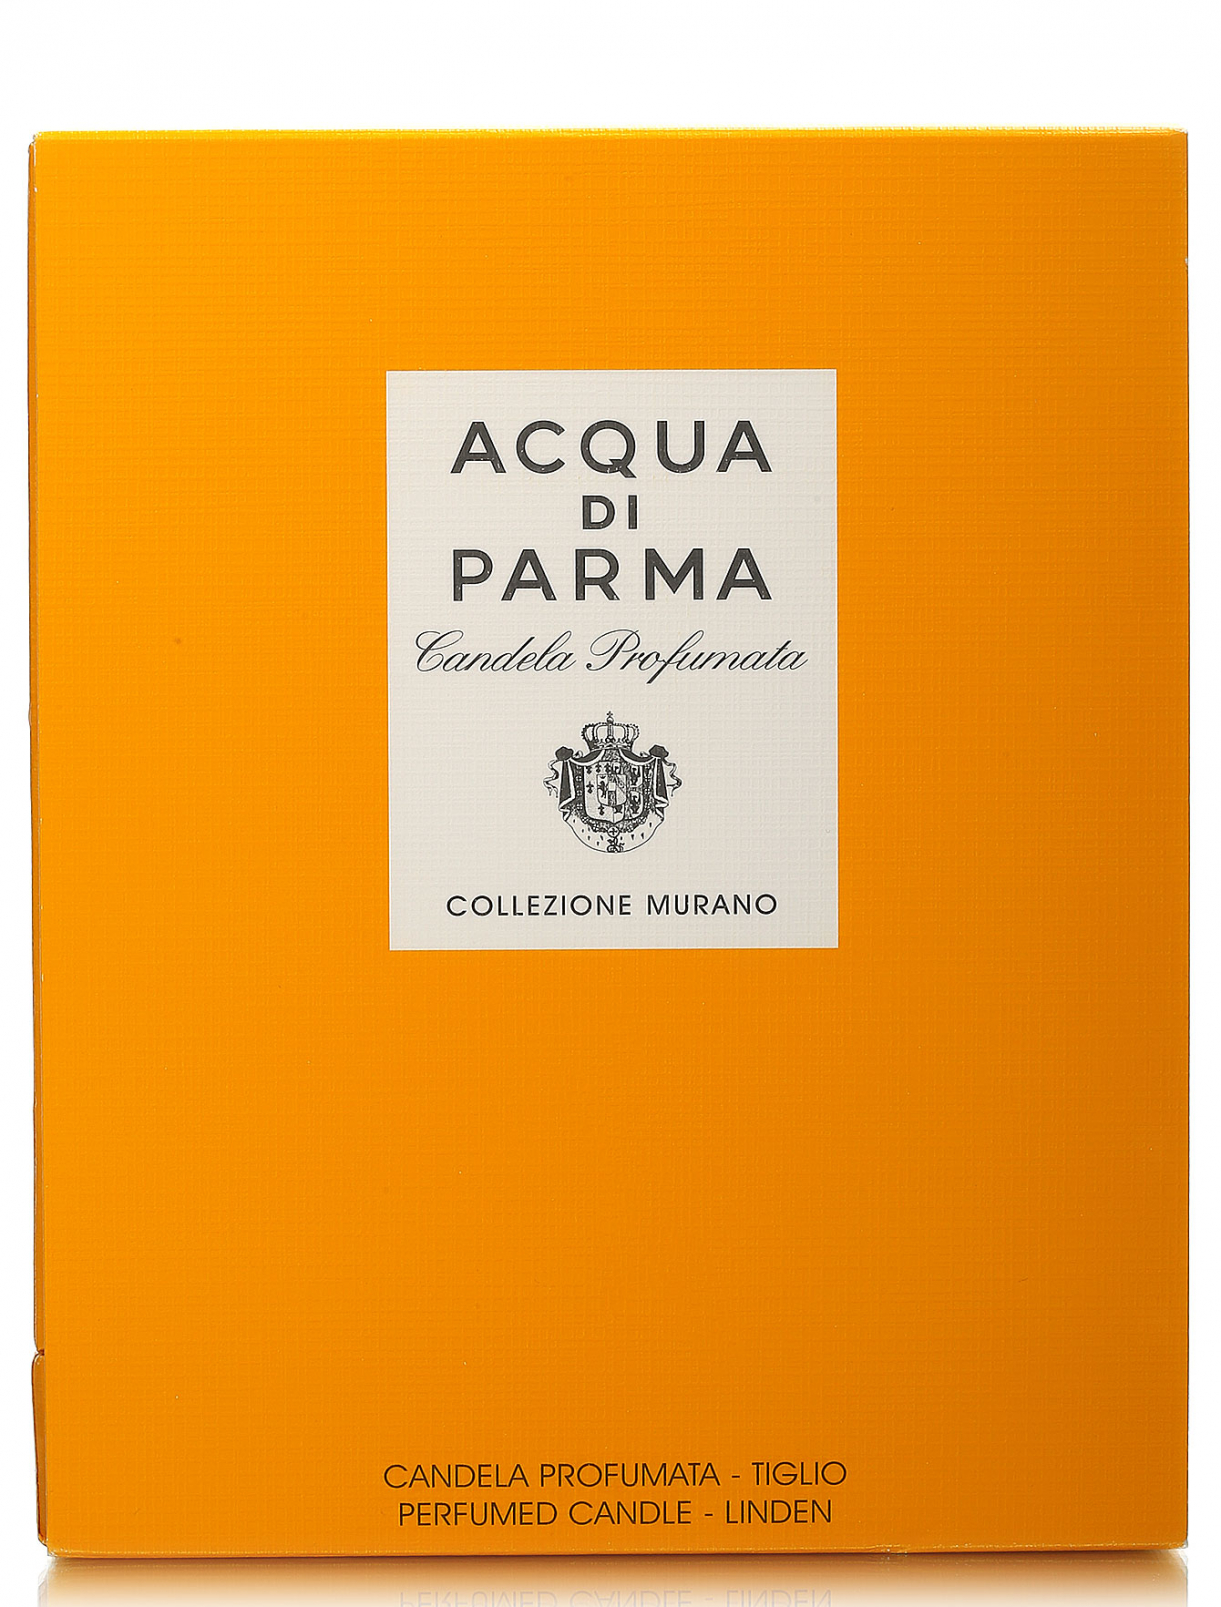 Свечи Home Fragrance Acqua di Parma  –  Модель Общий вид